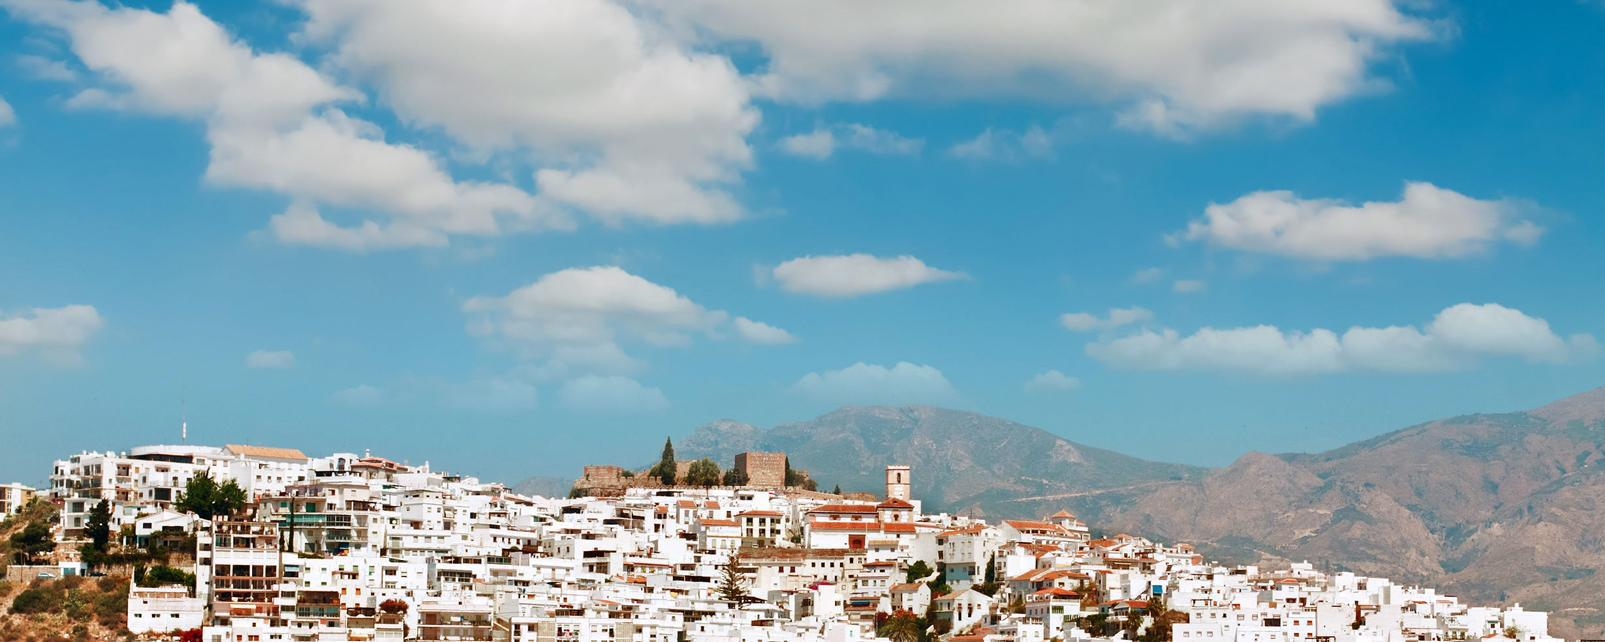 Europe; Espagne; Andalousie; Salobreña;